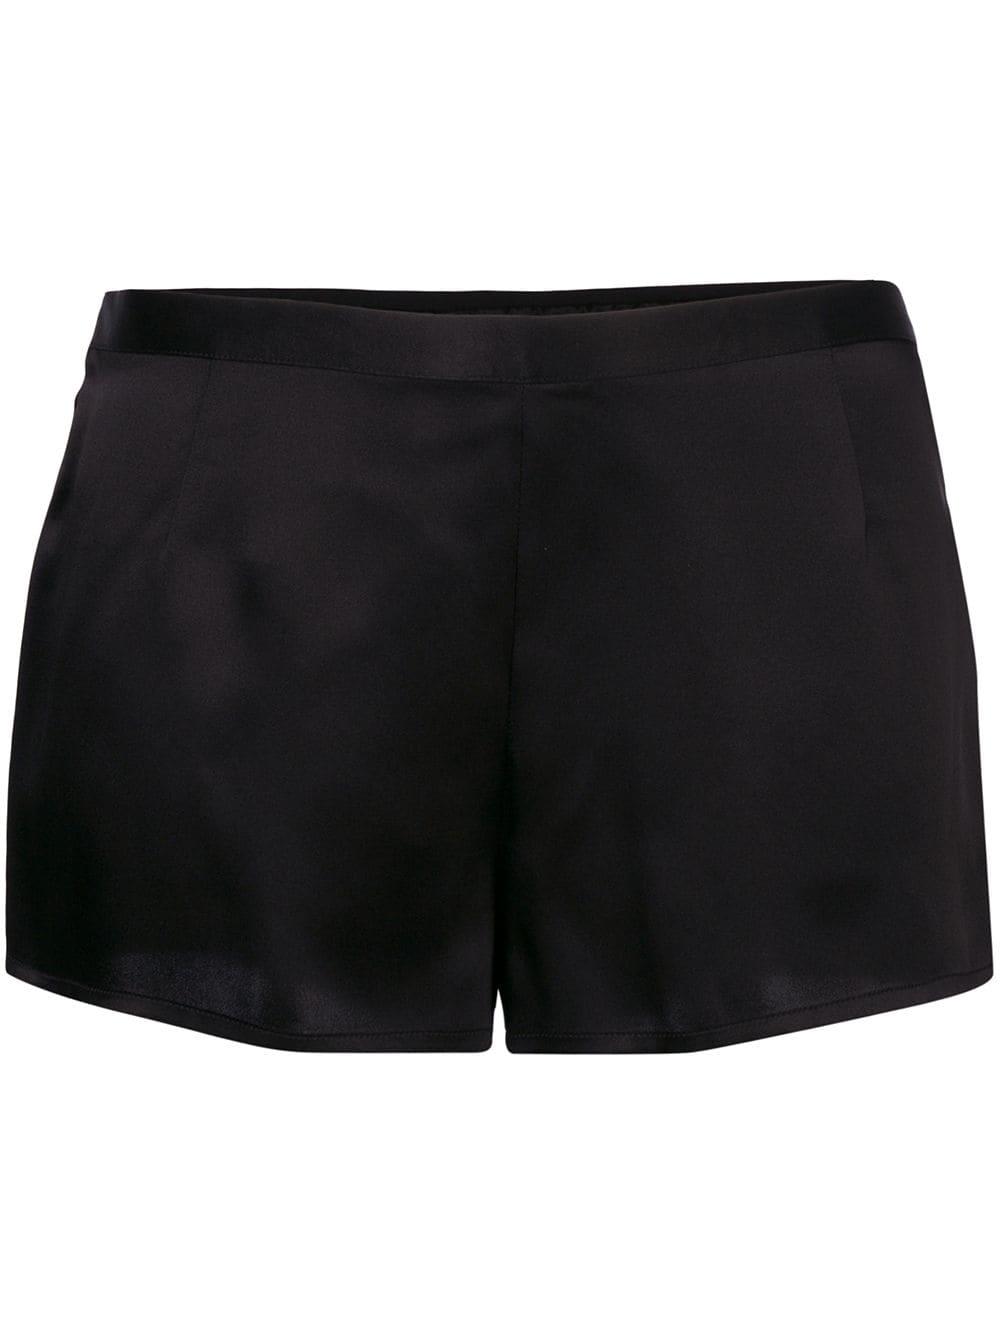 Silk Silk Pajama Shorts